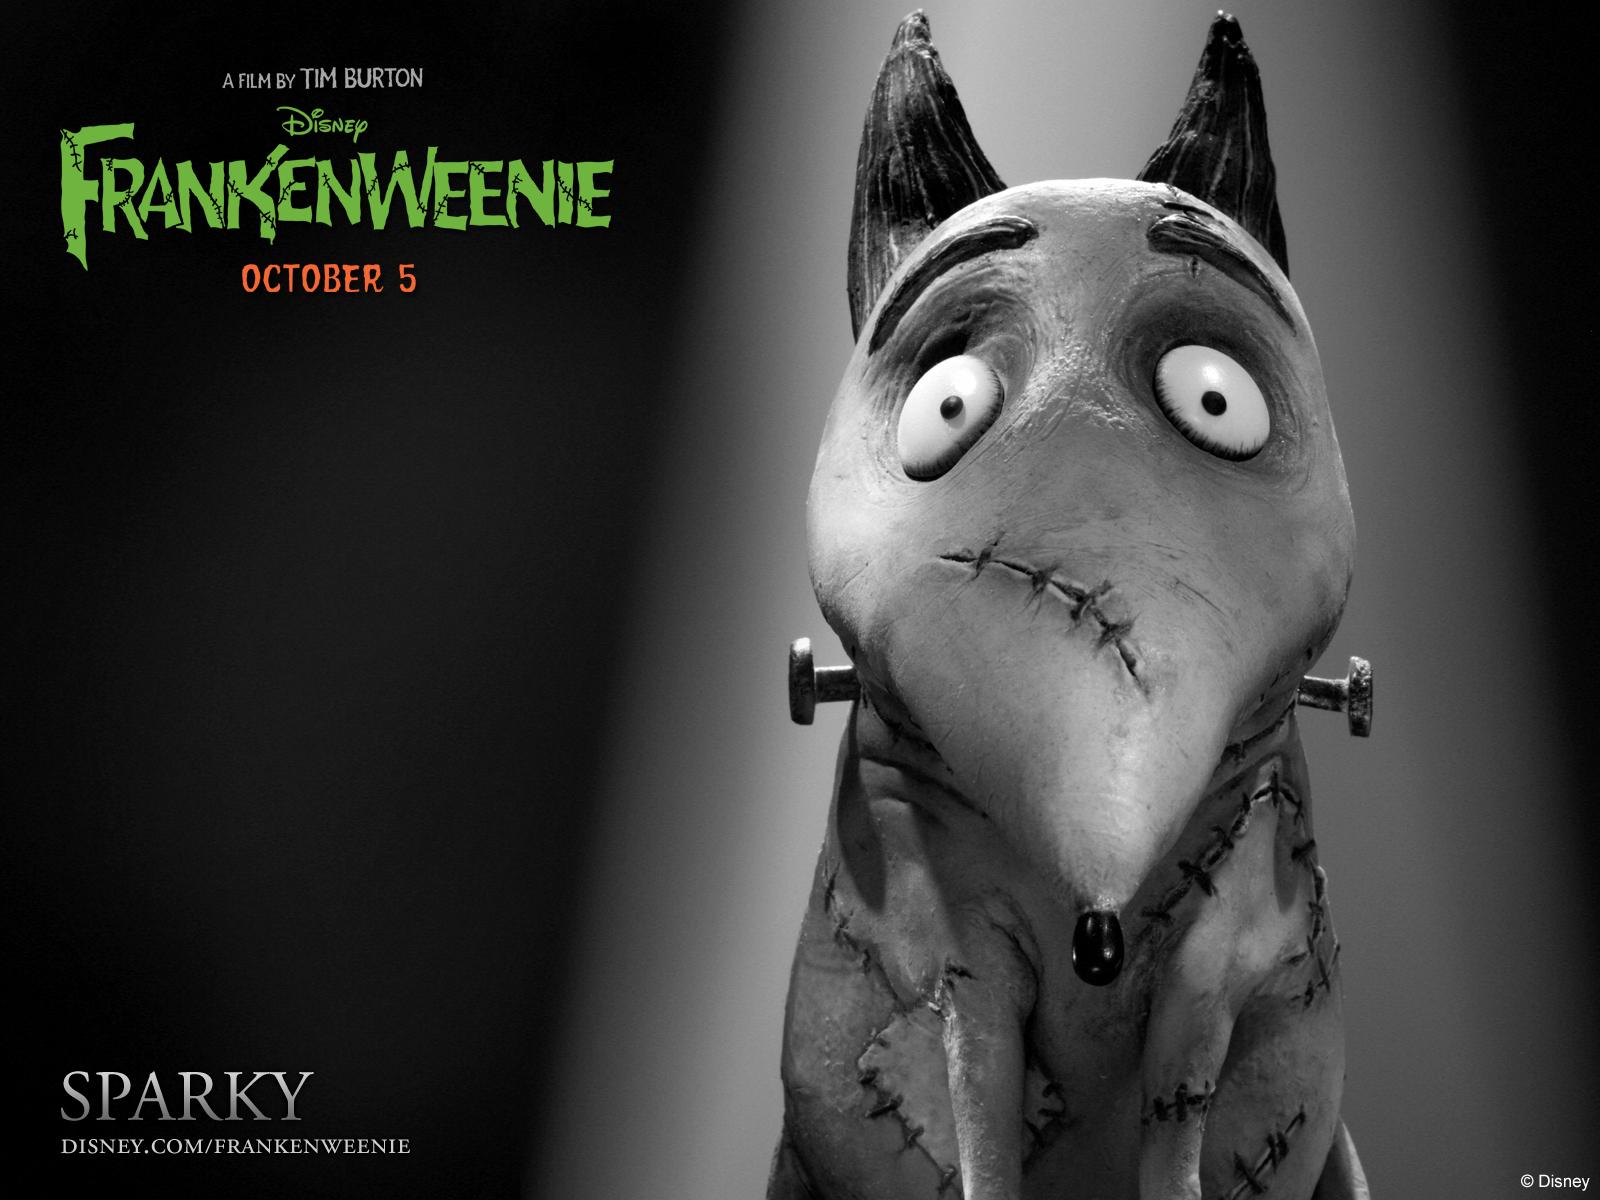 Frankenweenie (Tim Burton, 2012),